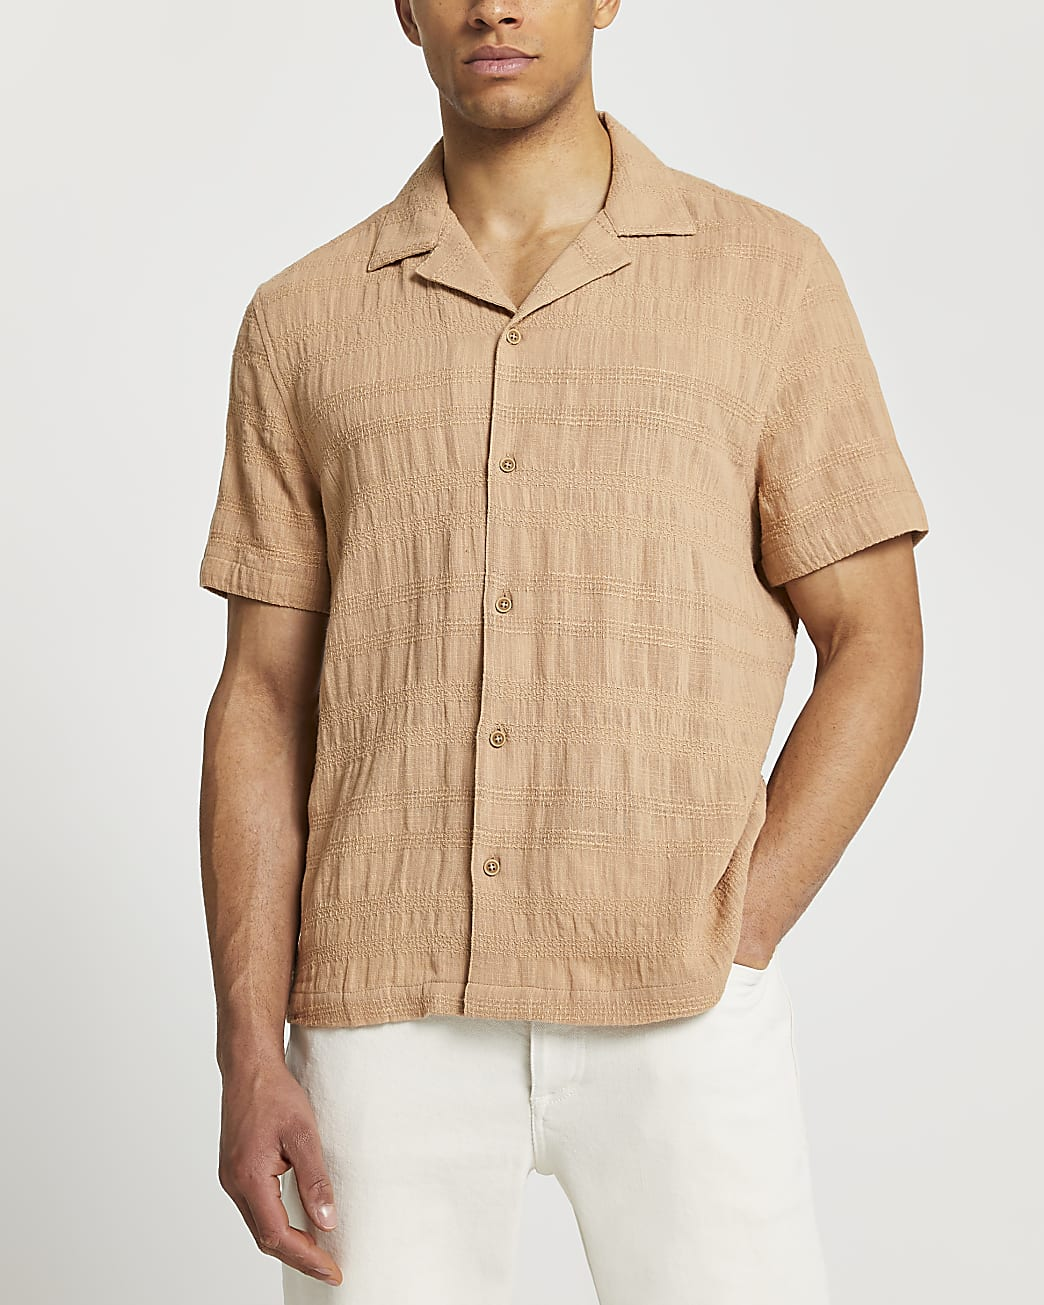 Beige textured short sleeve revere shirt